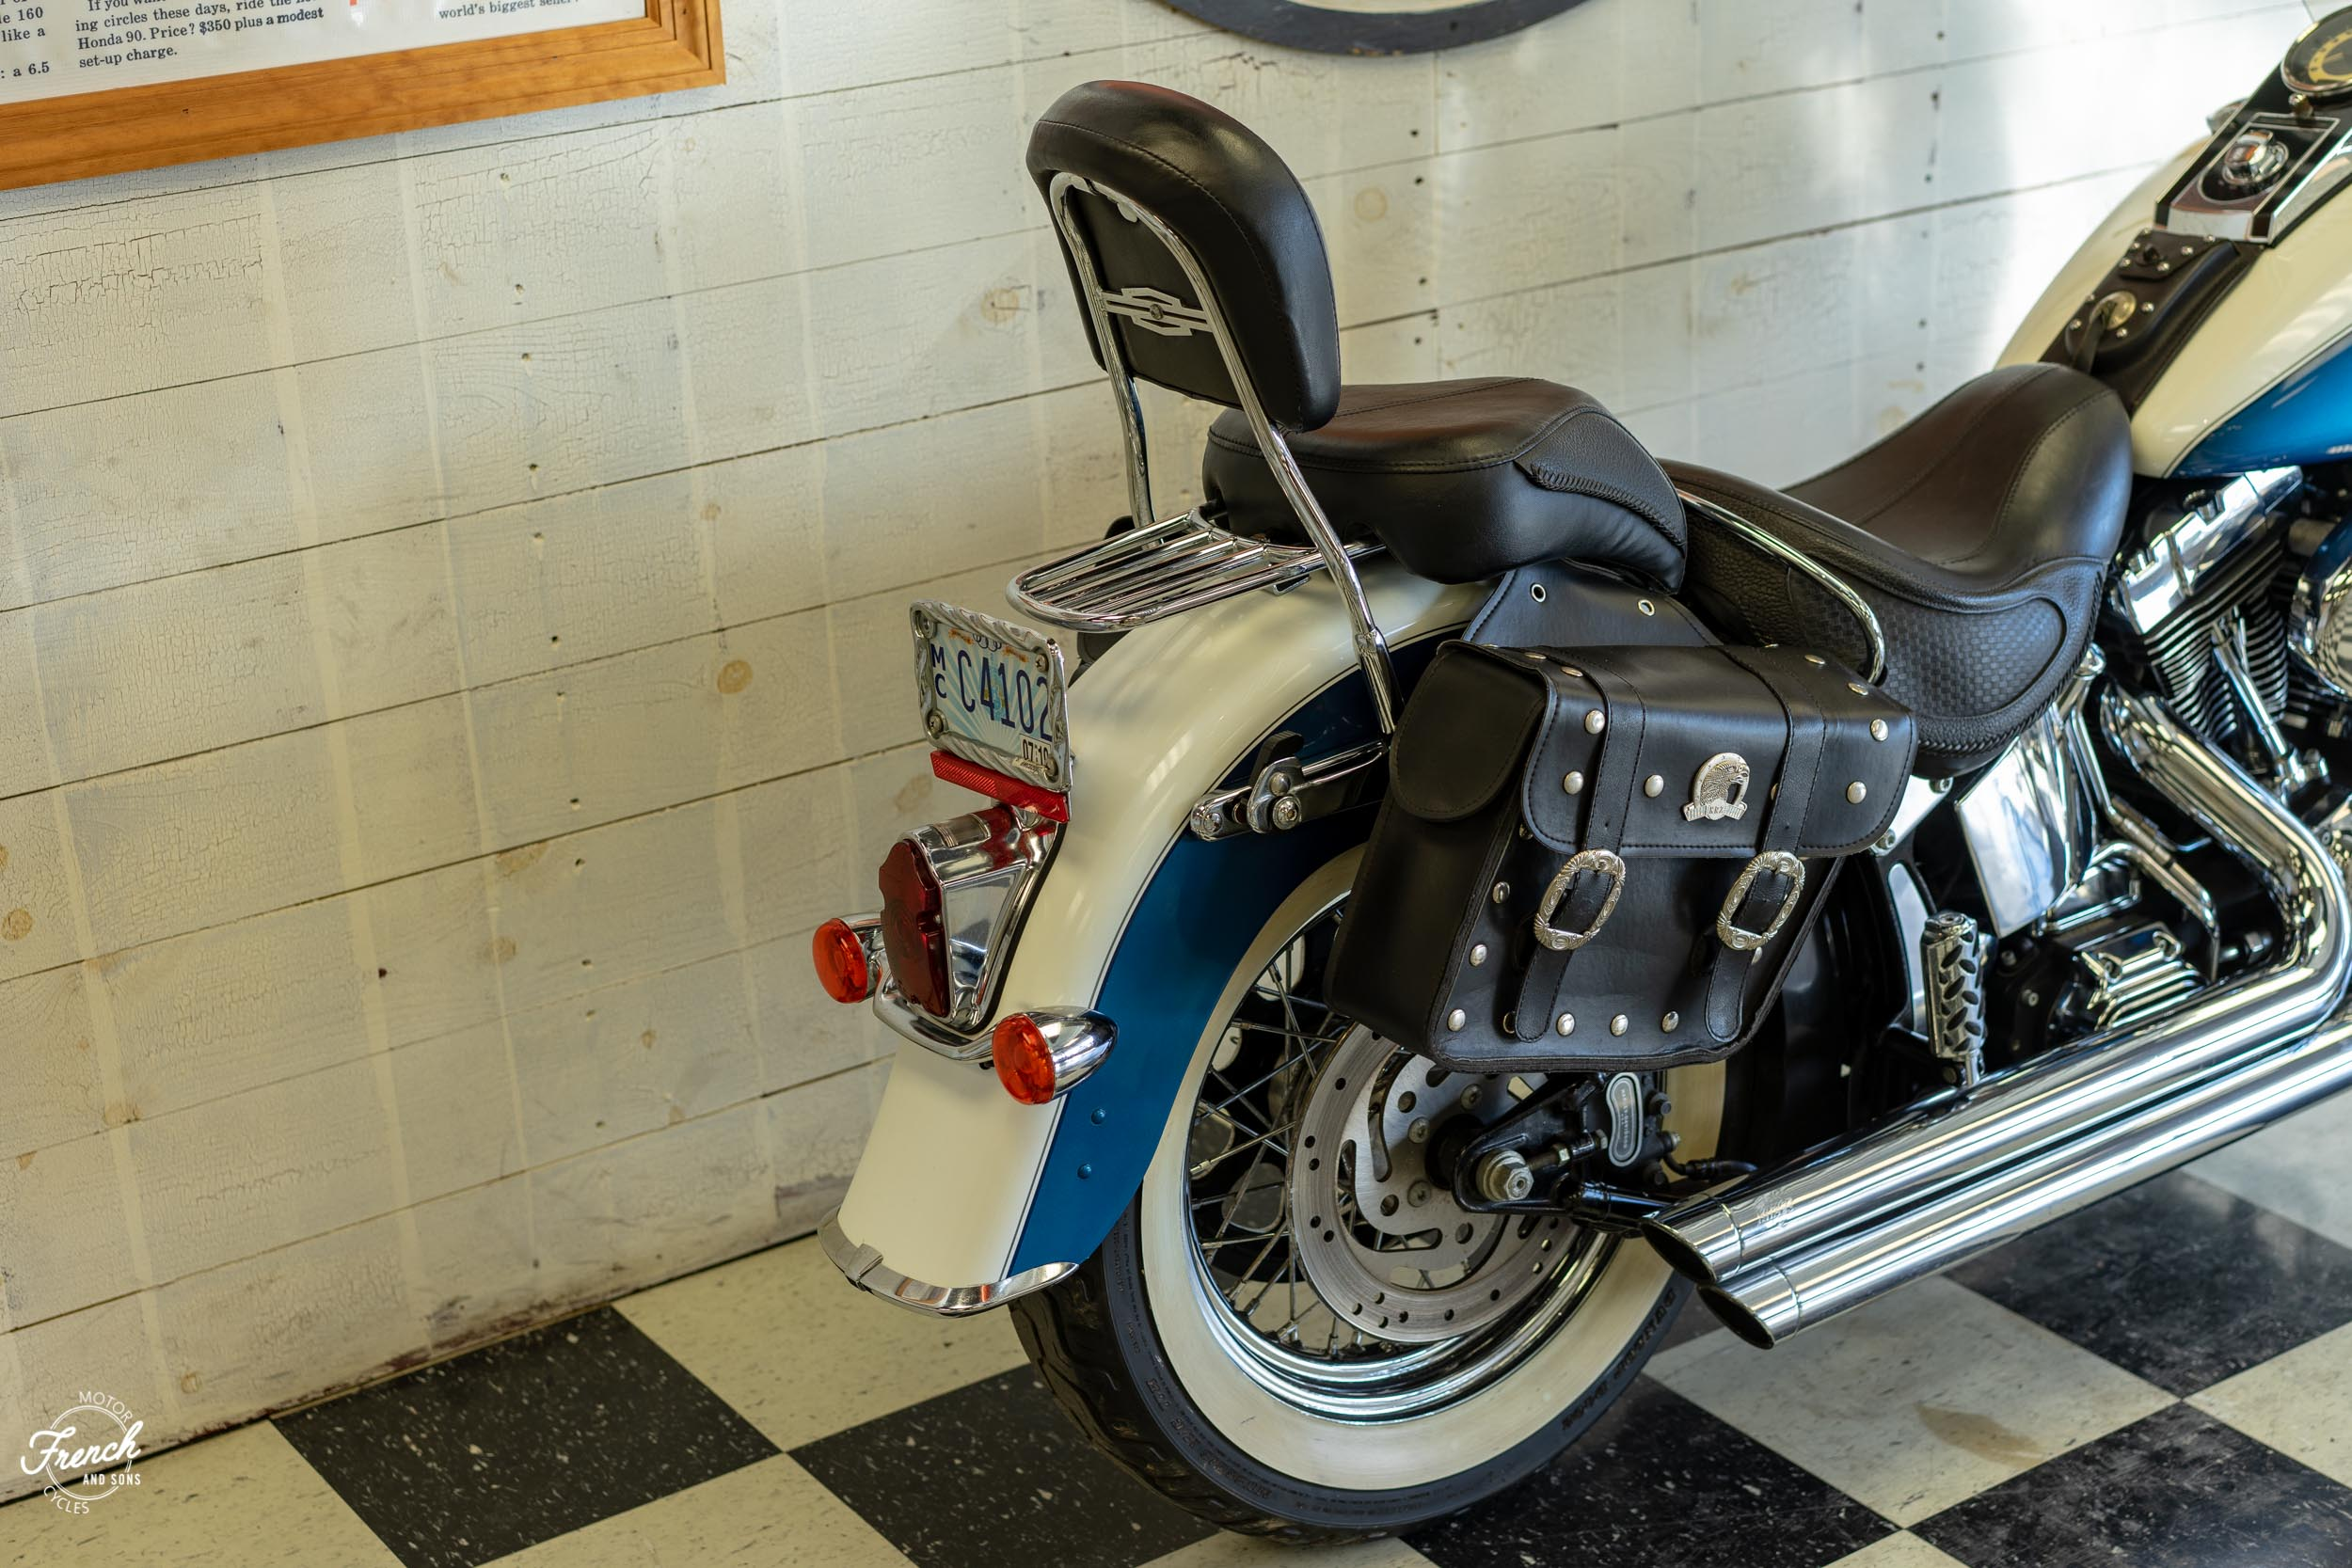 2005_Harley_Davidson_Softail_Deluxe-8.jpg